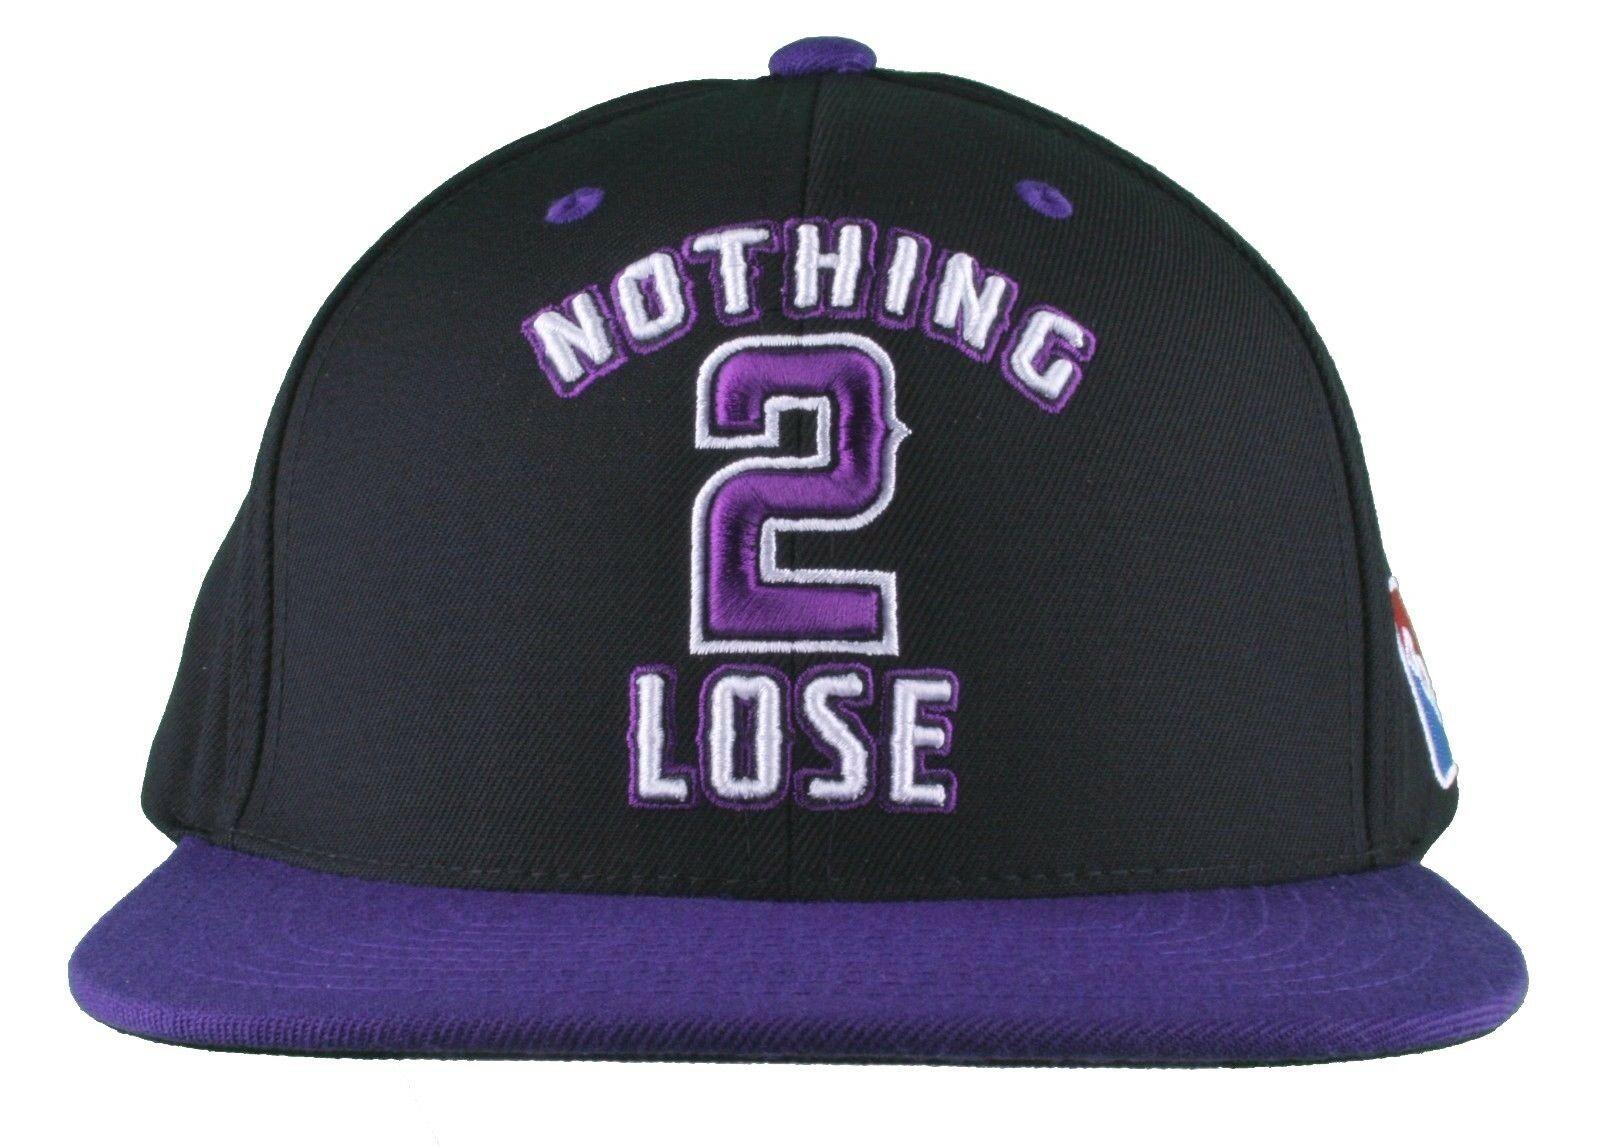 DGK Dirty Ghetto Kinder Schwarz Lila Nothing Sich 2 Verlieren Baseball Hut Nwt